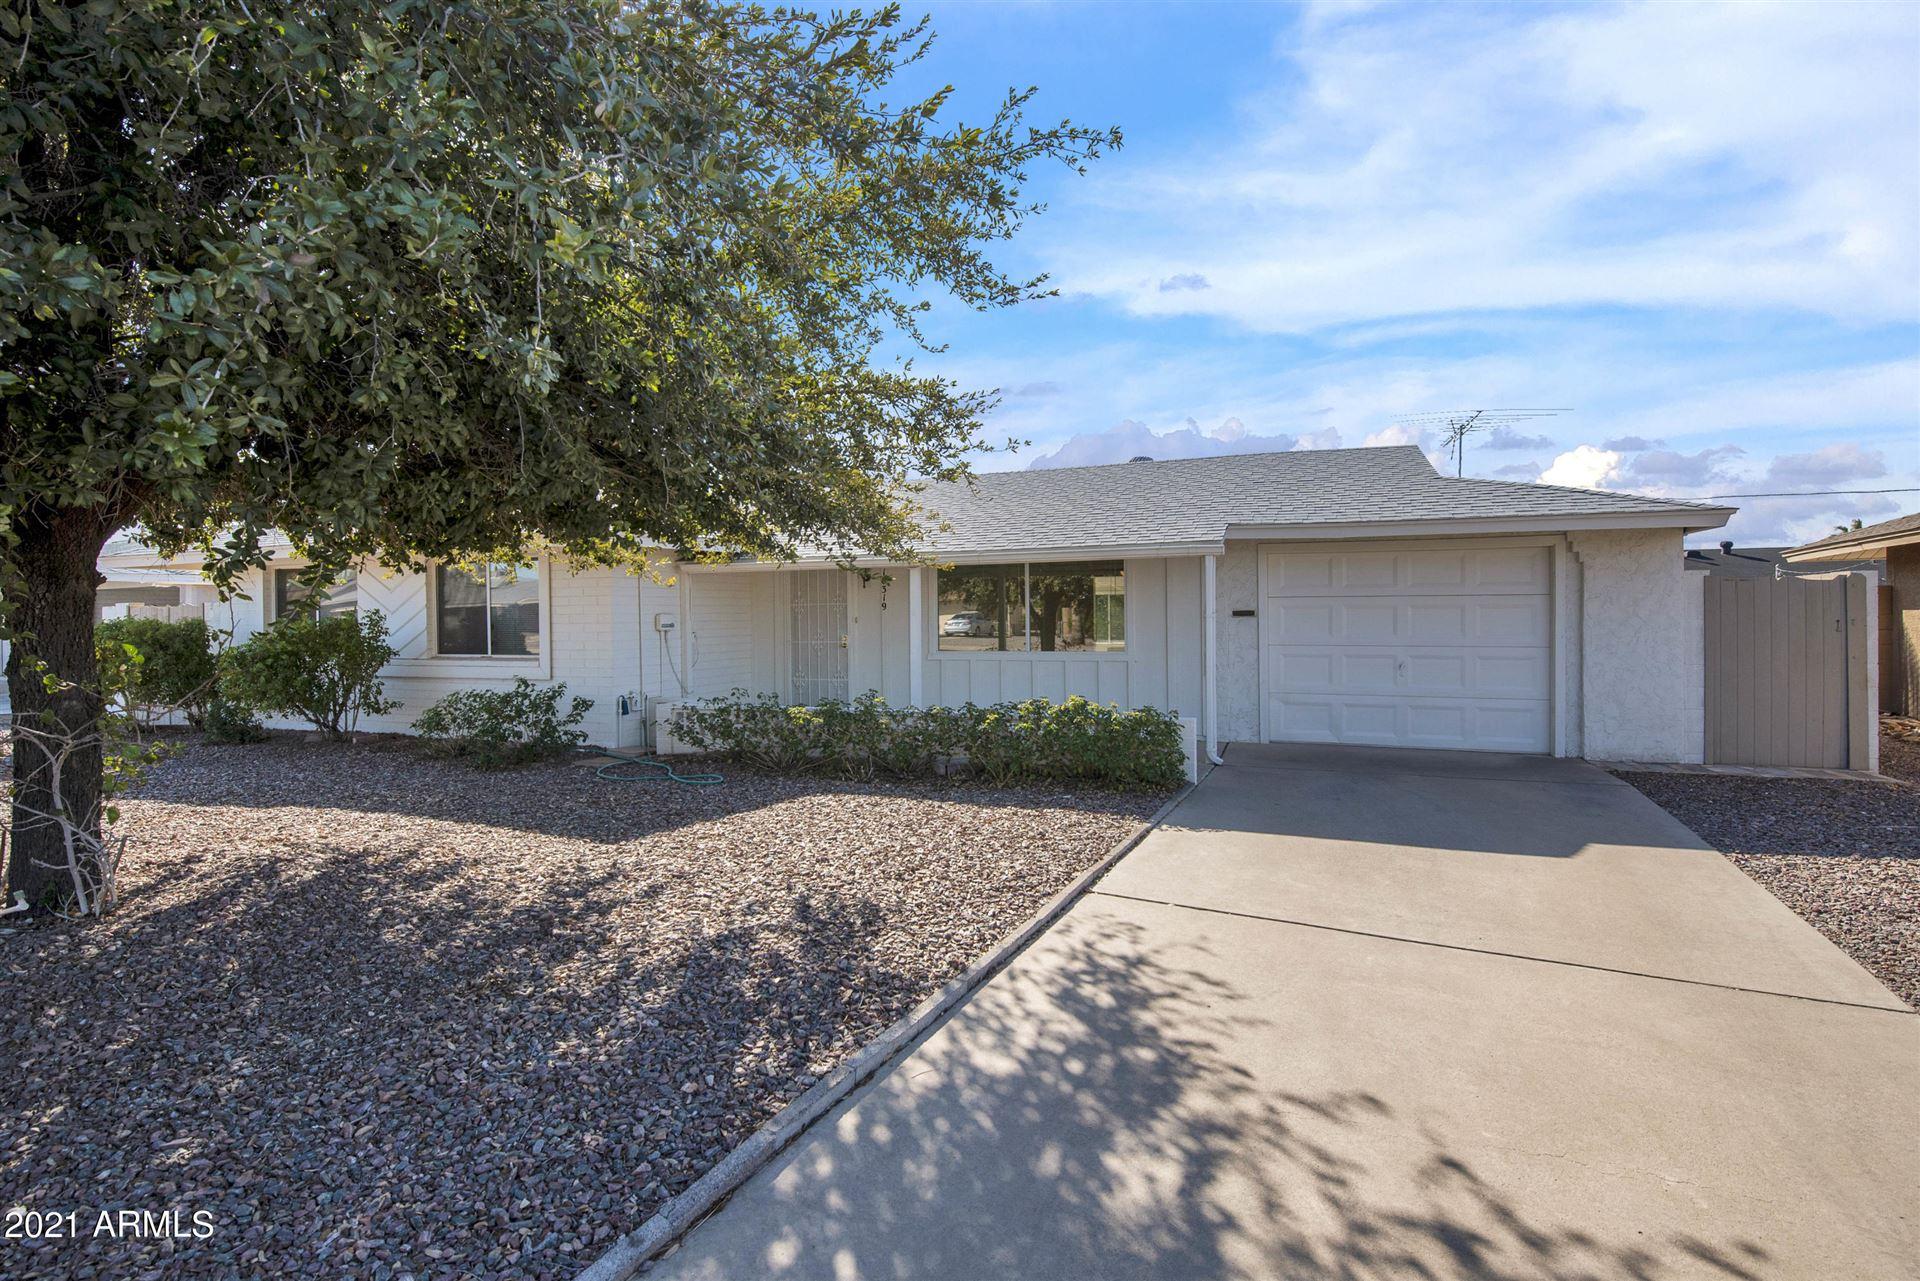 Photo of 10319 W SUN CITY Boulevard, Sun City, AZ 85351 (MLS # 6199831)